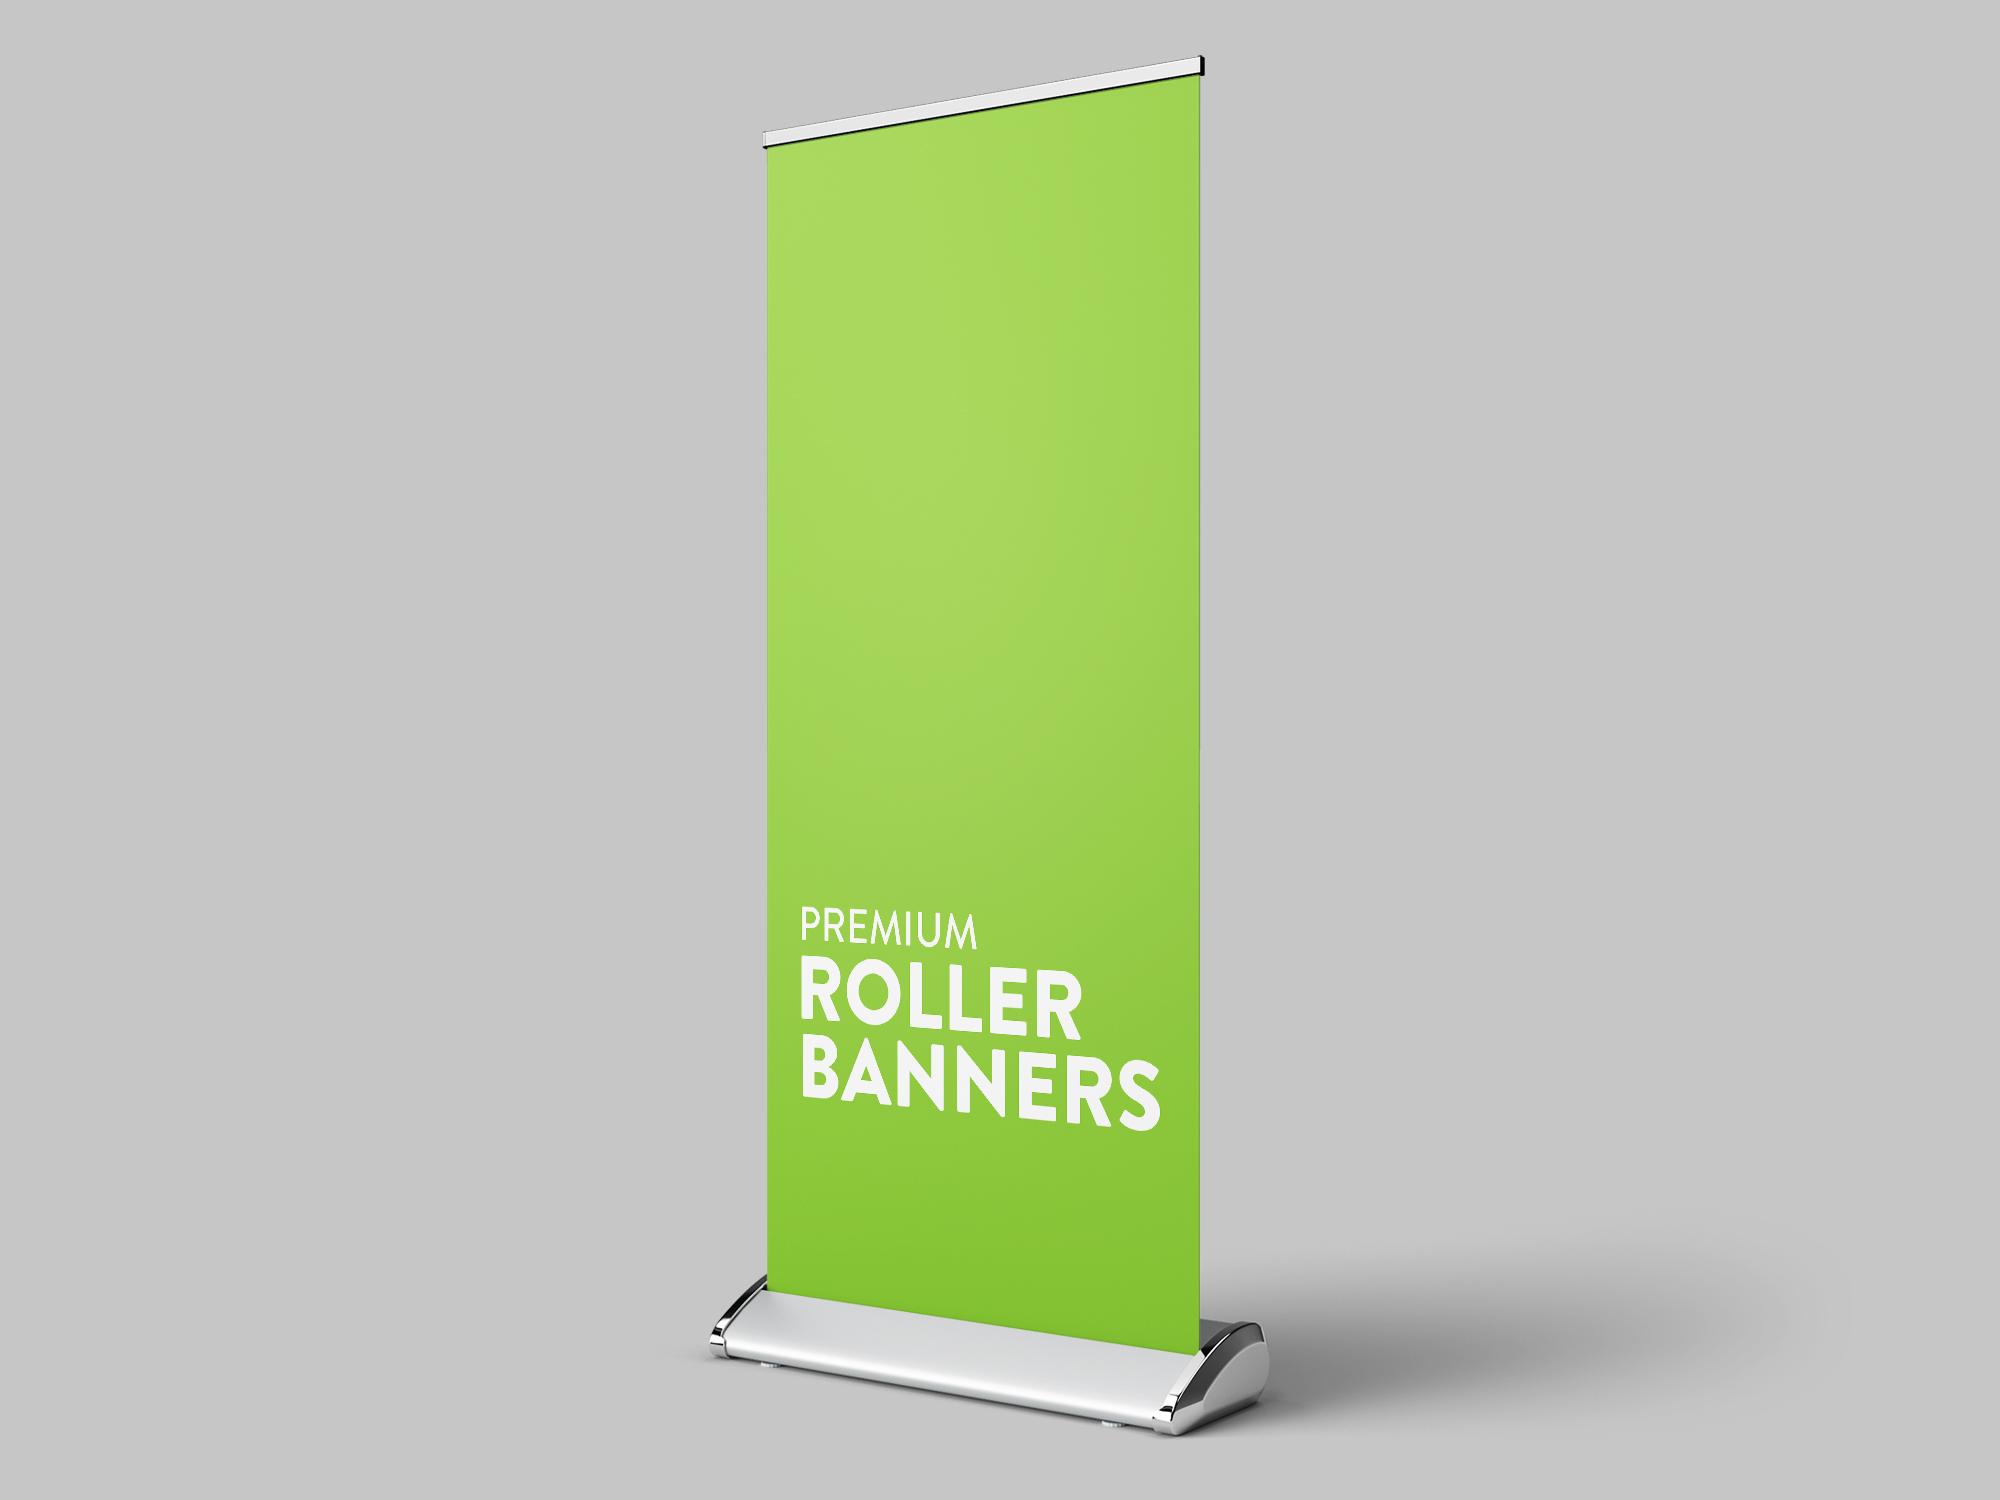 Premium Roller Banner Printing Jersey